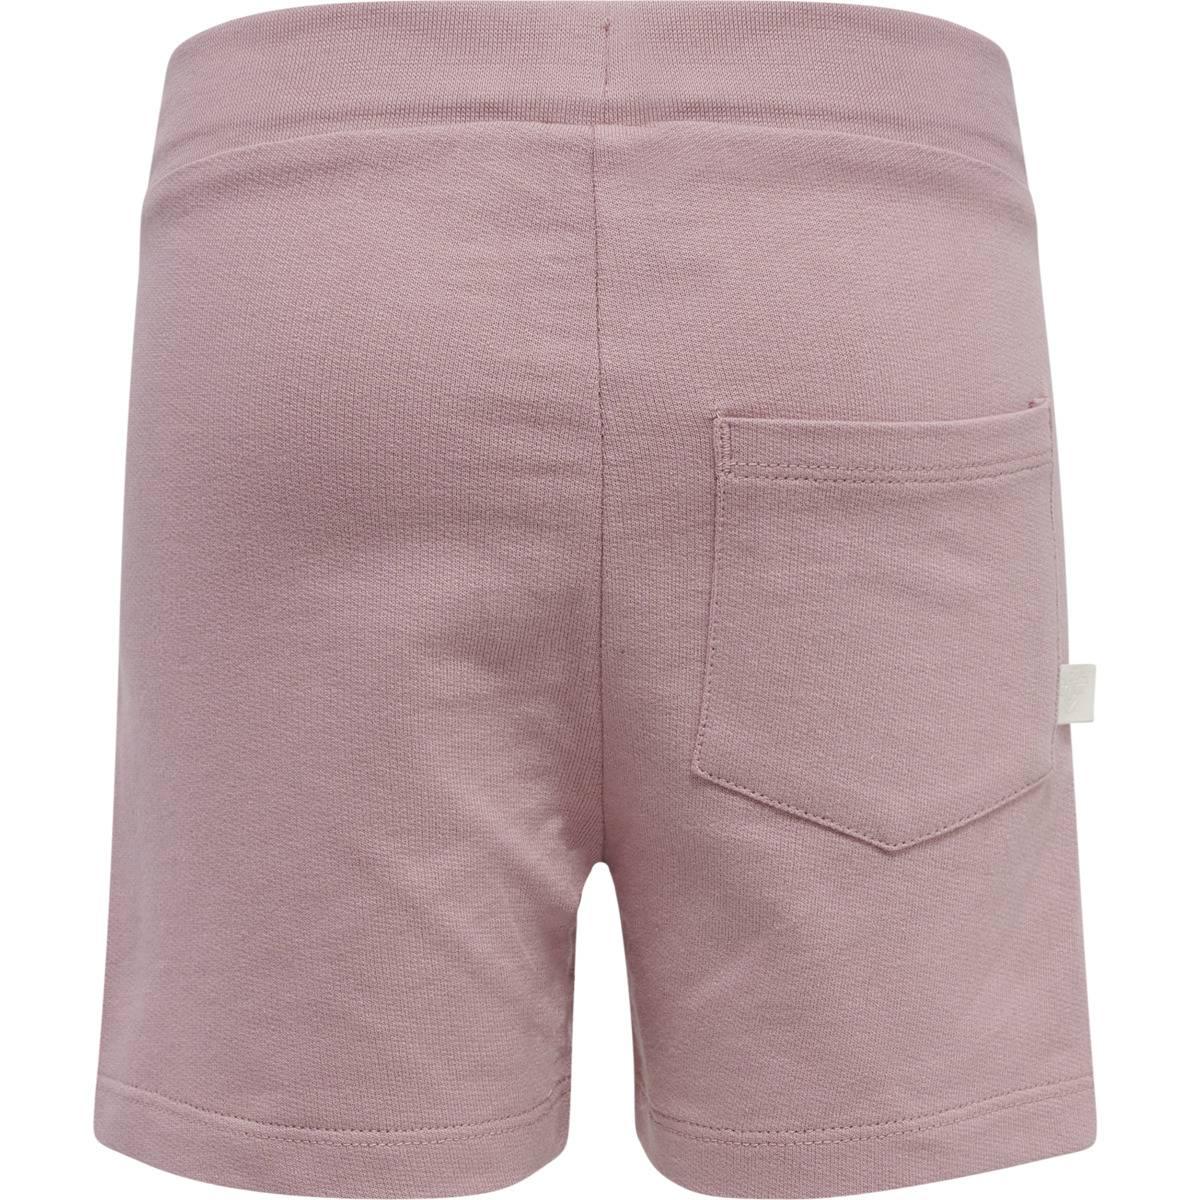 Hummel Proud shorts mini - lilas